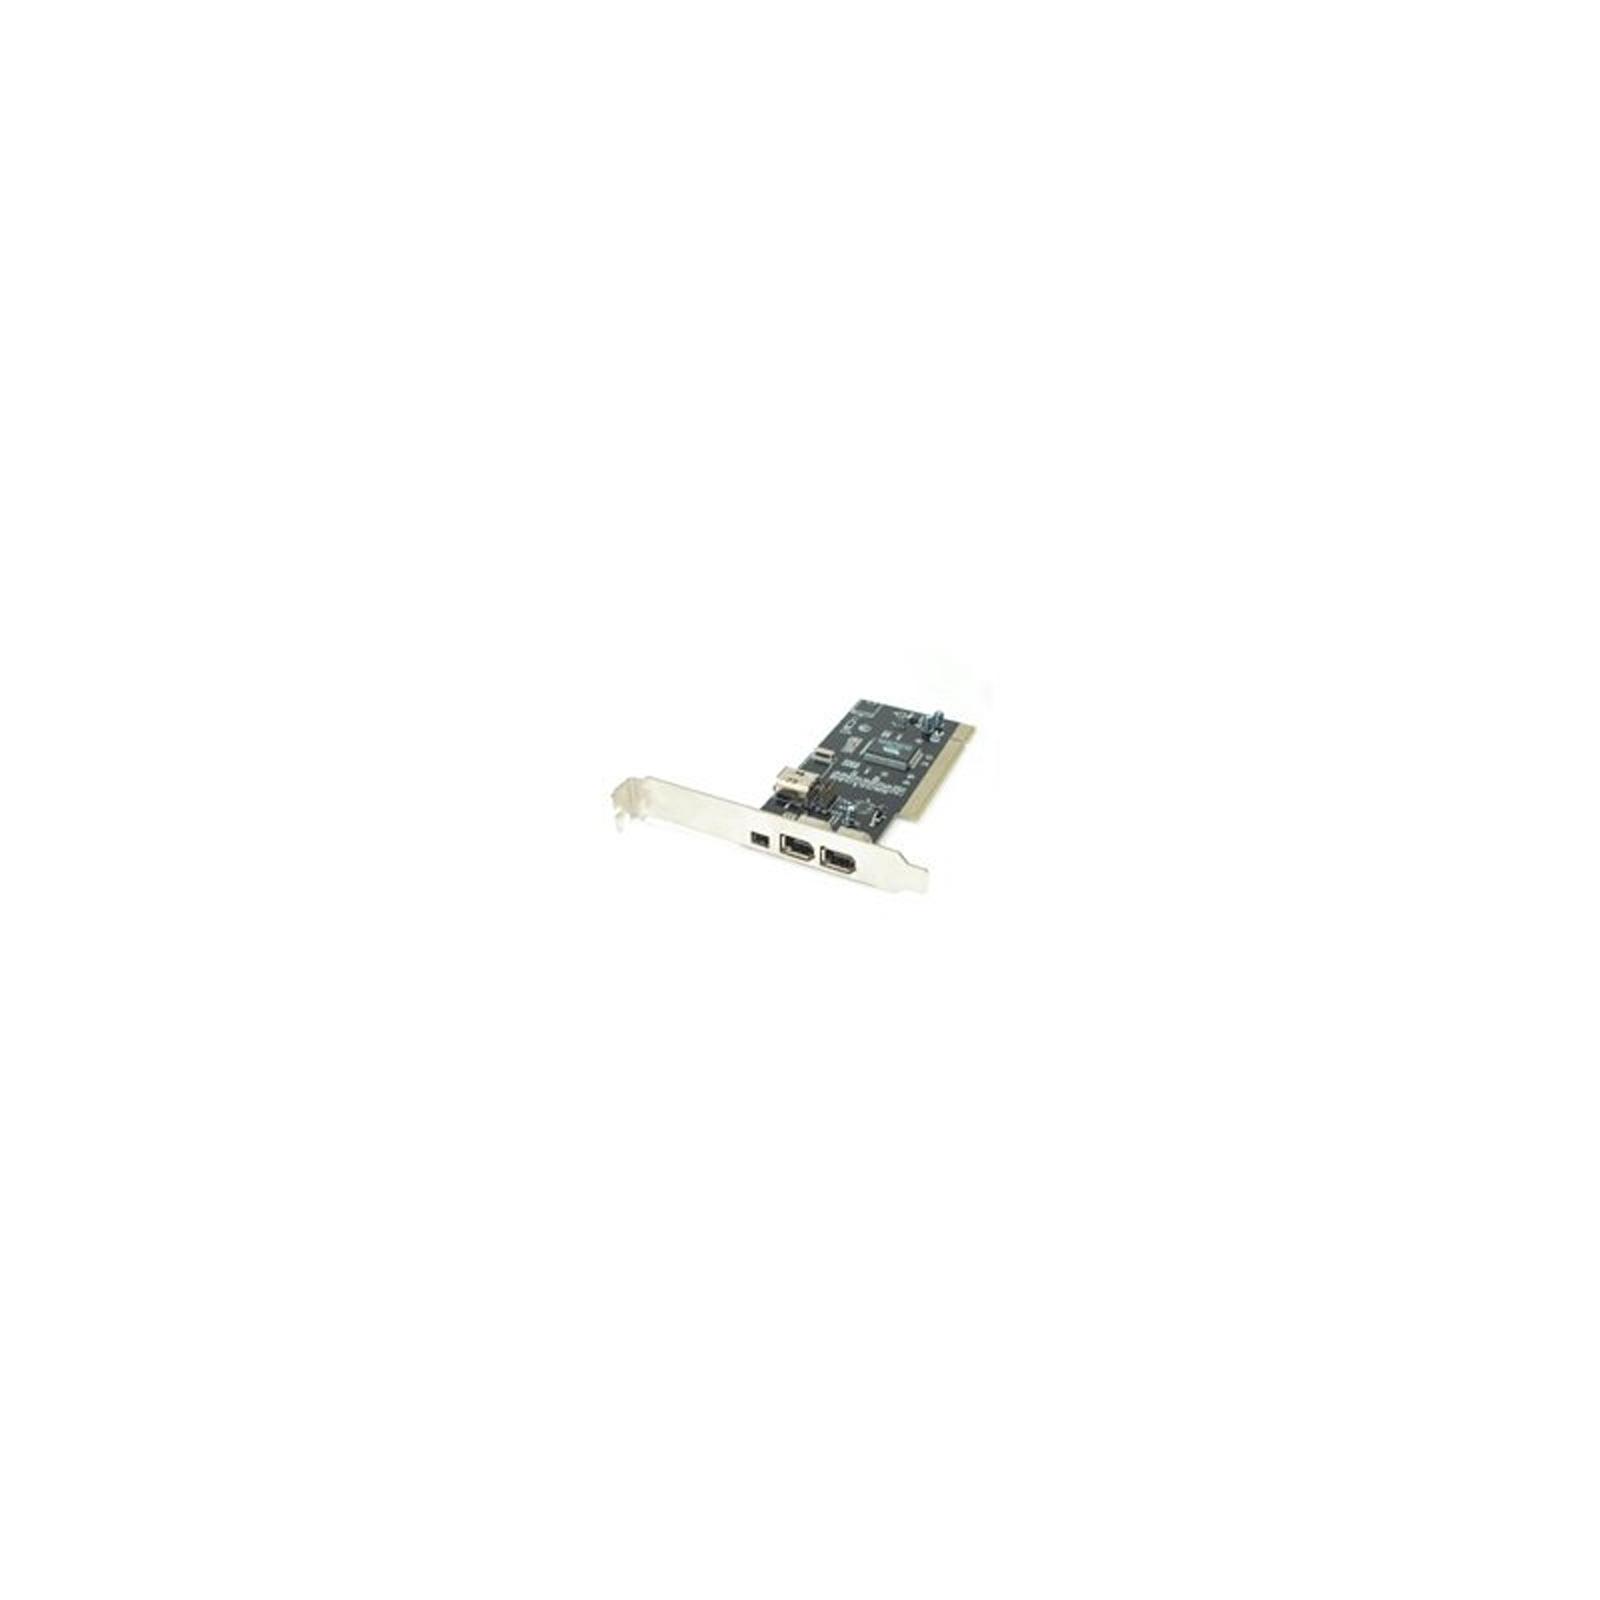 Контроллер PCI to 3xFirewire MAXXTRO (F-204 V (Via))